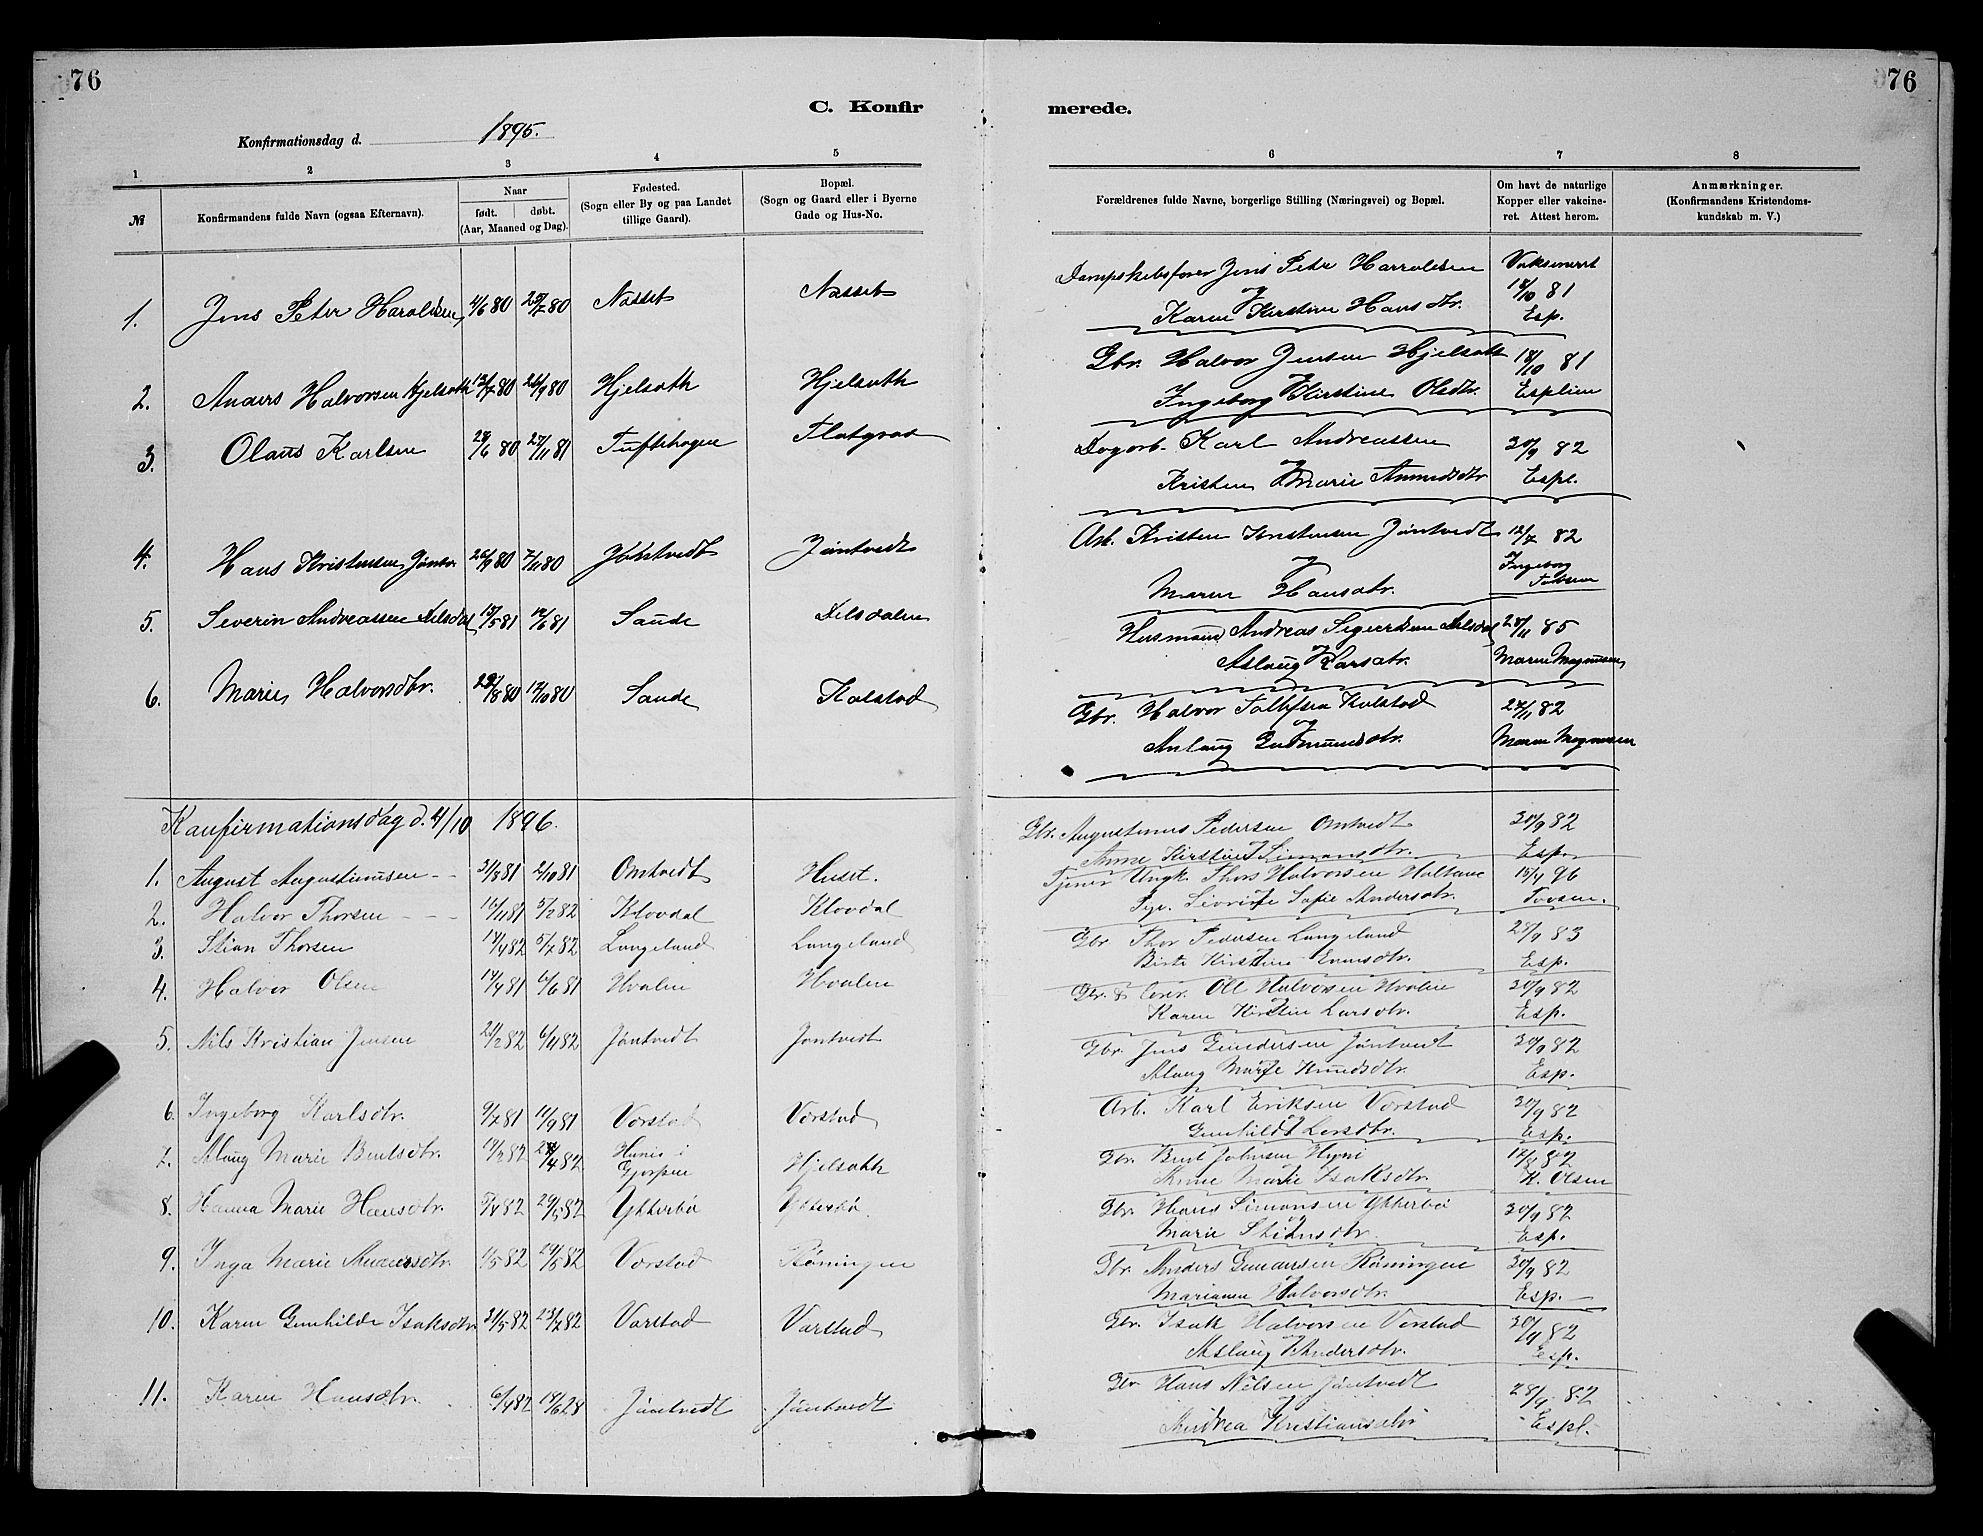 SAKO, Holla kirkebøker, G/Gb/L0001: Klokkerbok nr. II 1, 1882-1897, s. 76